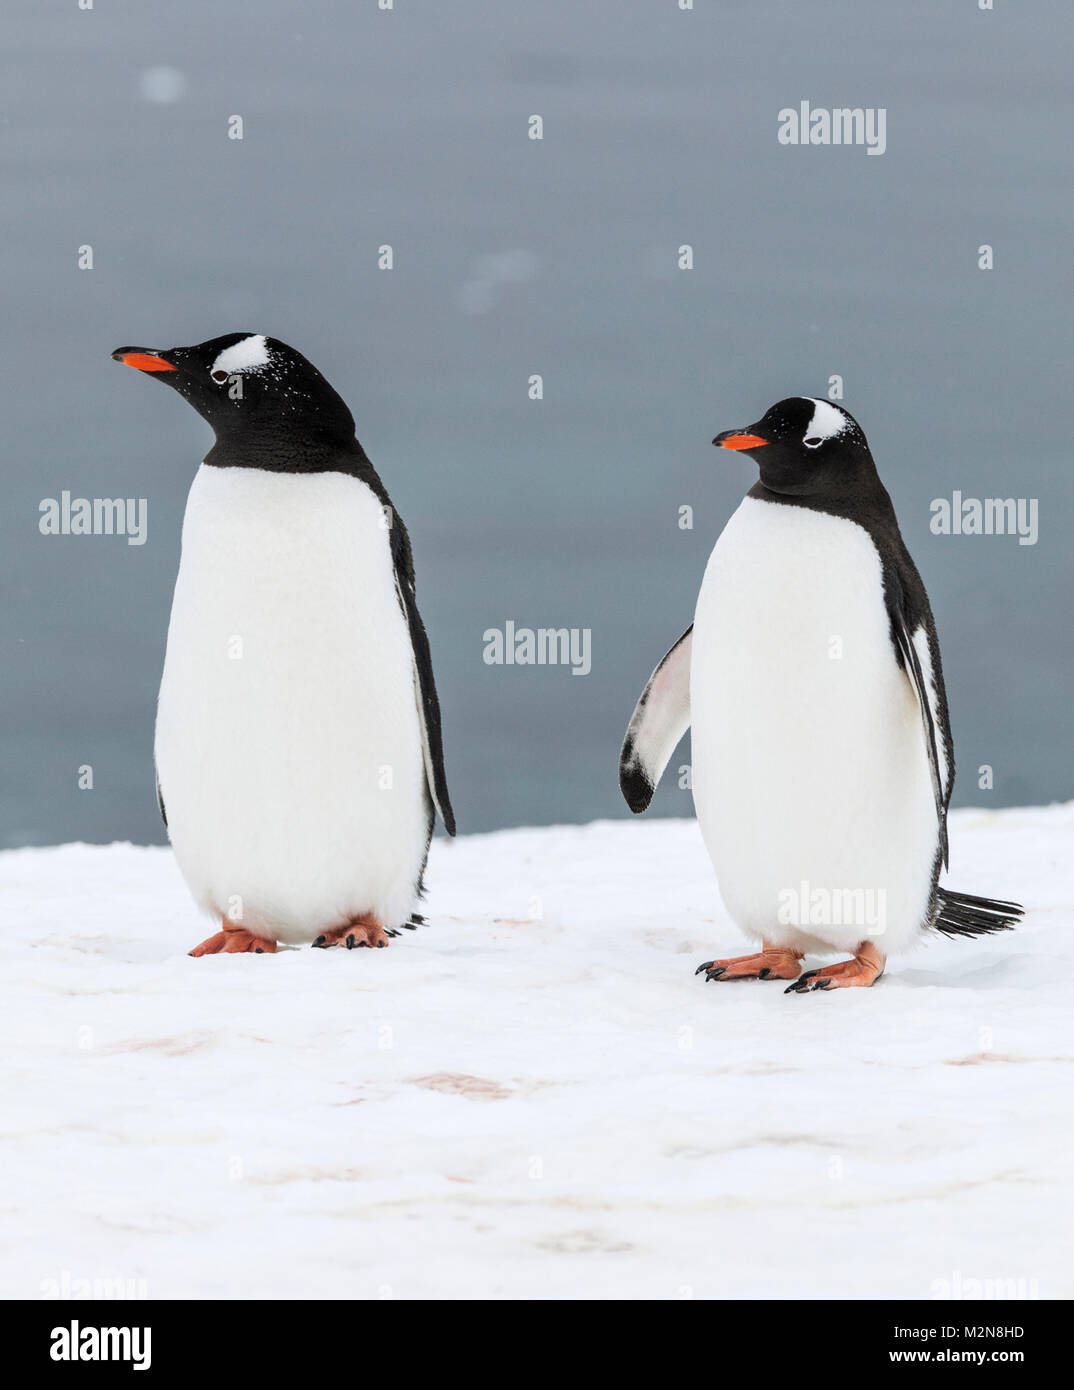 Largas colas; pingüinos Pygoscelis papua; Isla Cuverville; La Antártida Imagen De Stock